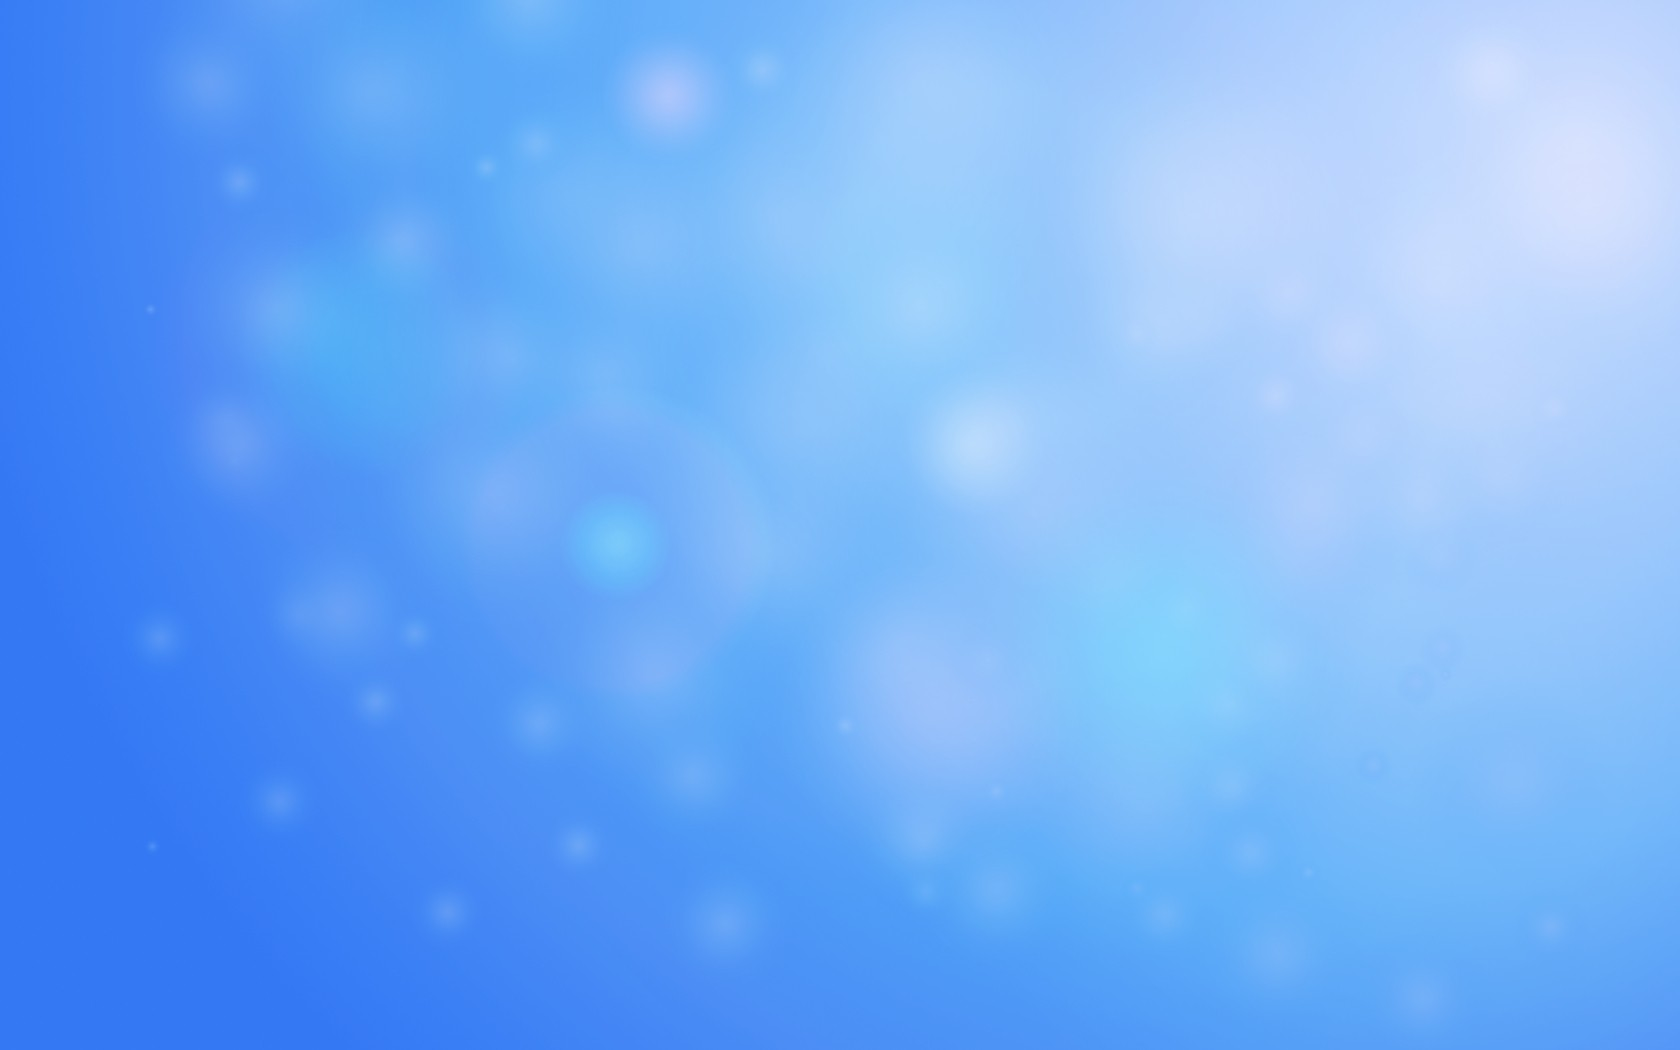 1680x1050 Light Blue Bokeh desktop PC and Mac wallpaper 1680x1050